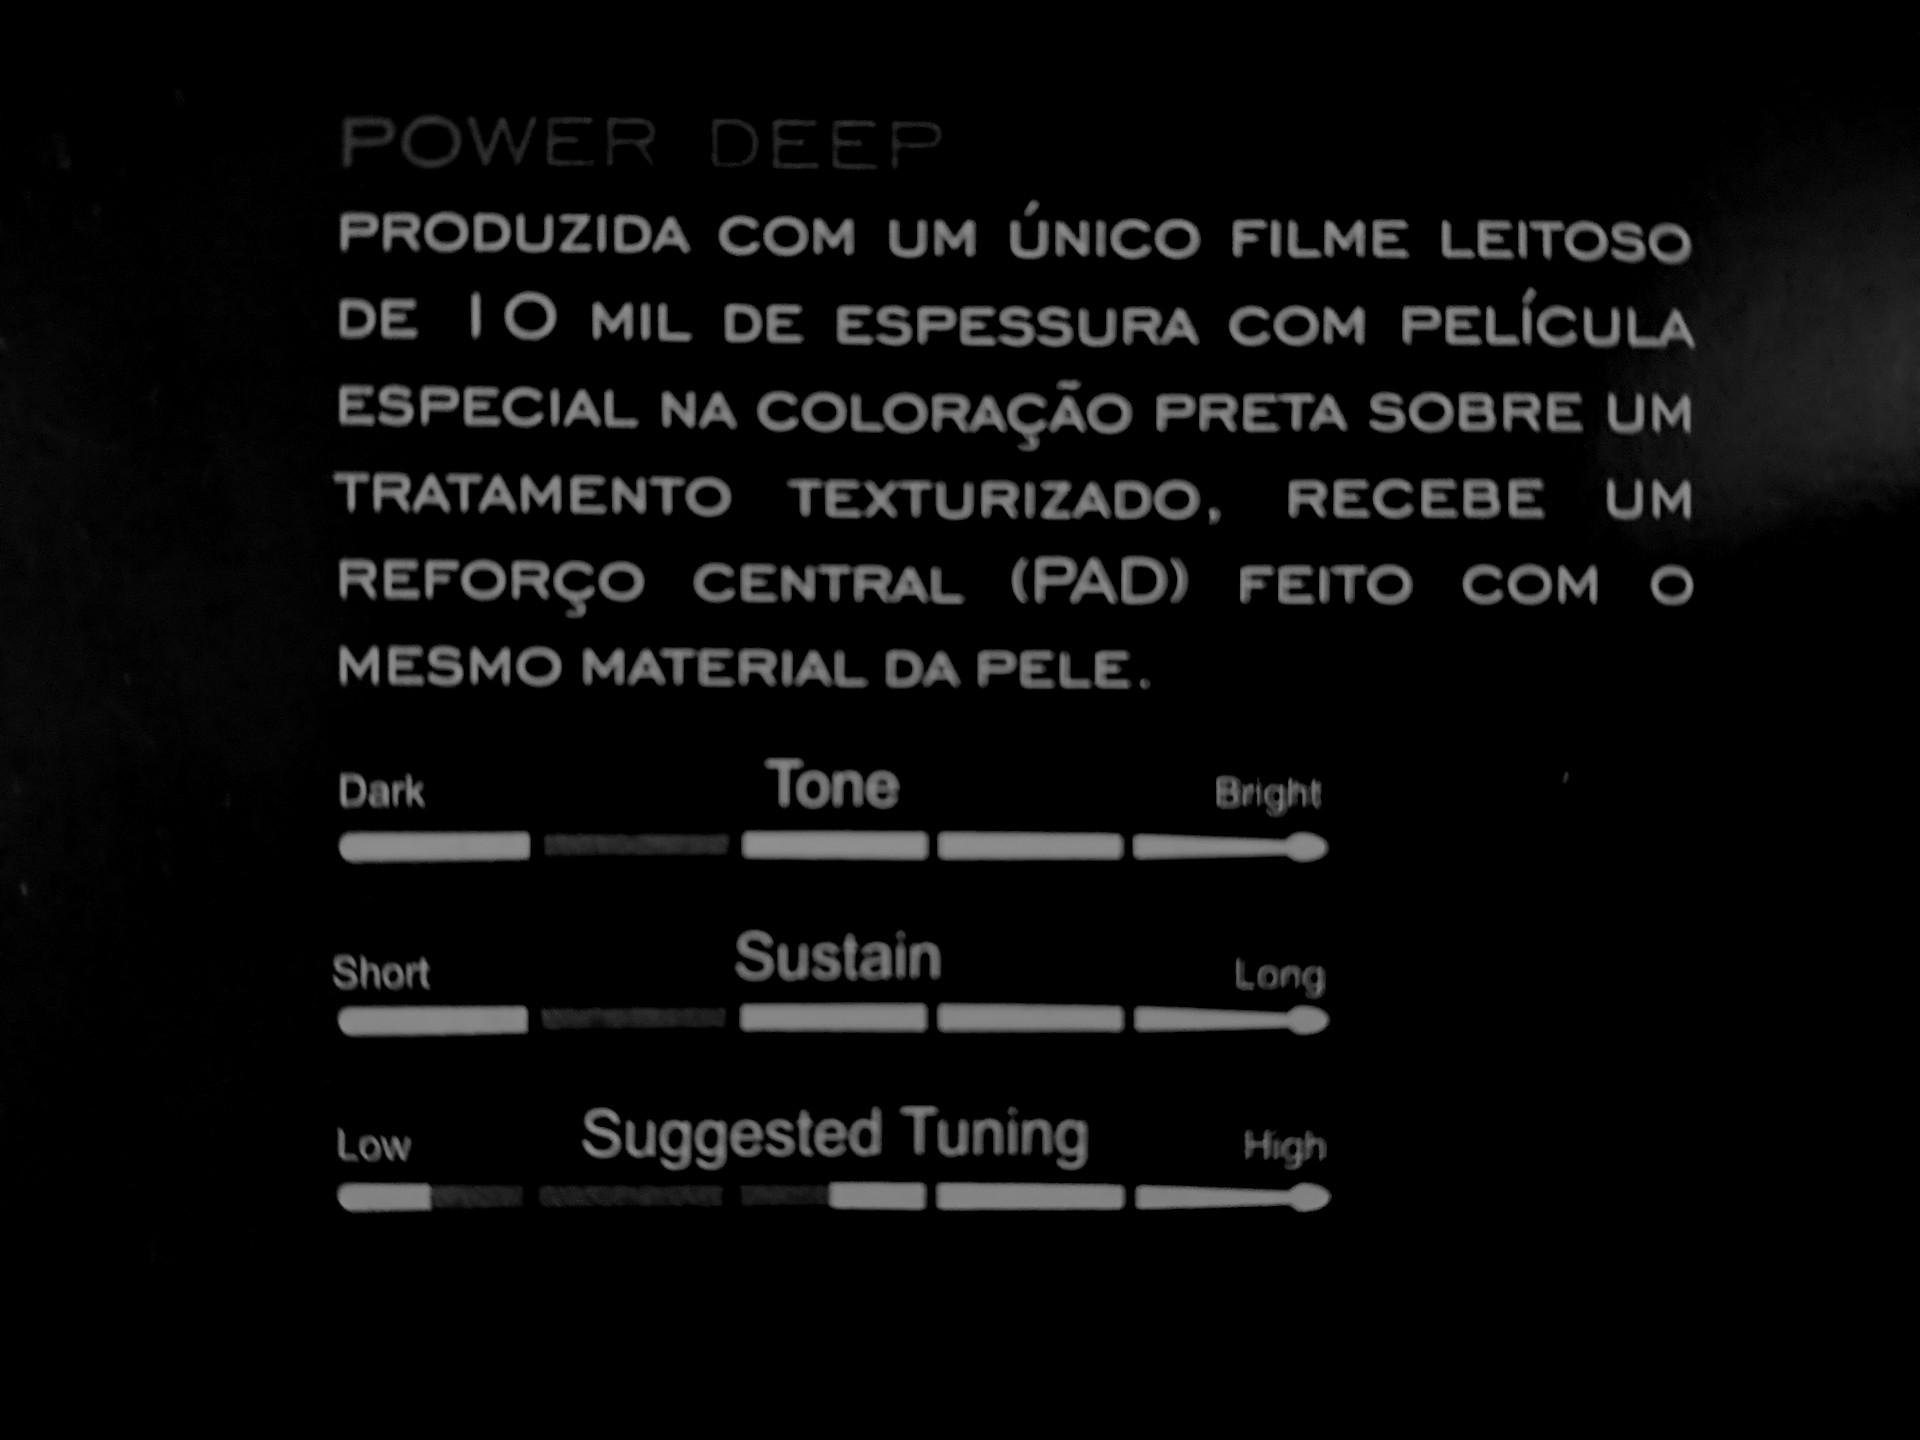 "Pele texturizada POWER DEEP C/ PAD 20"" Dudu Portes, LUEN."